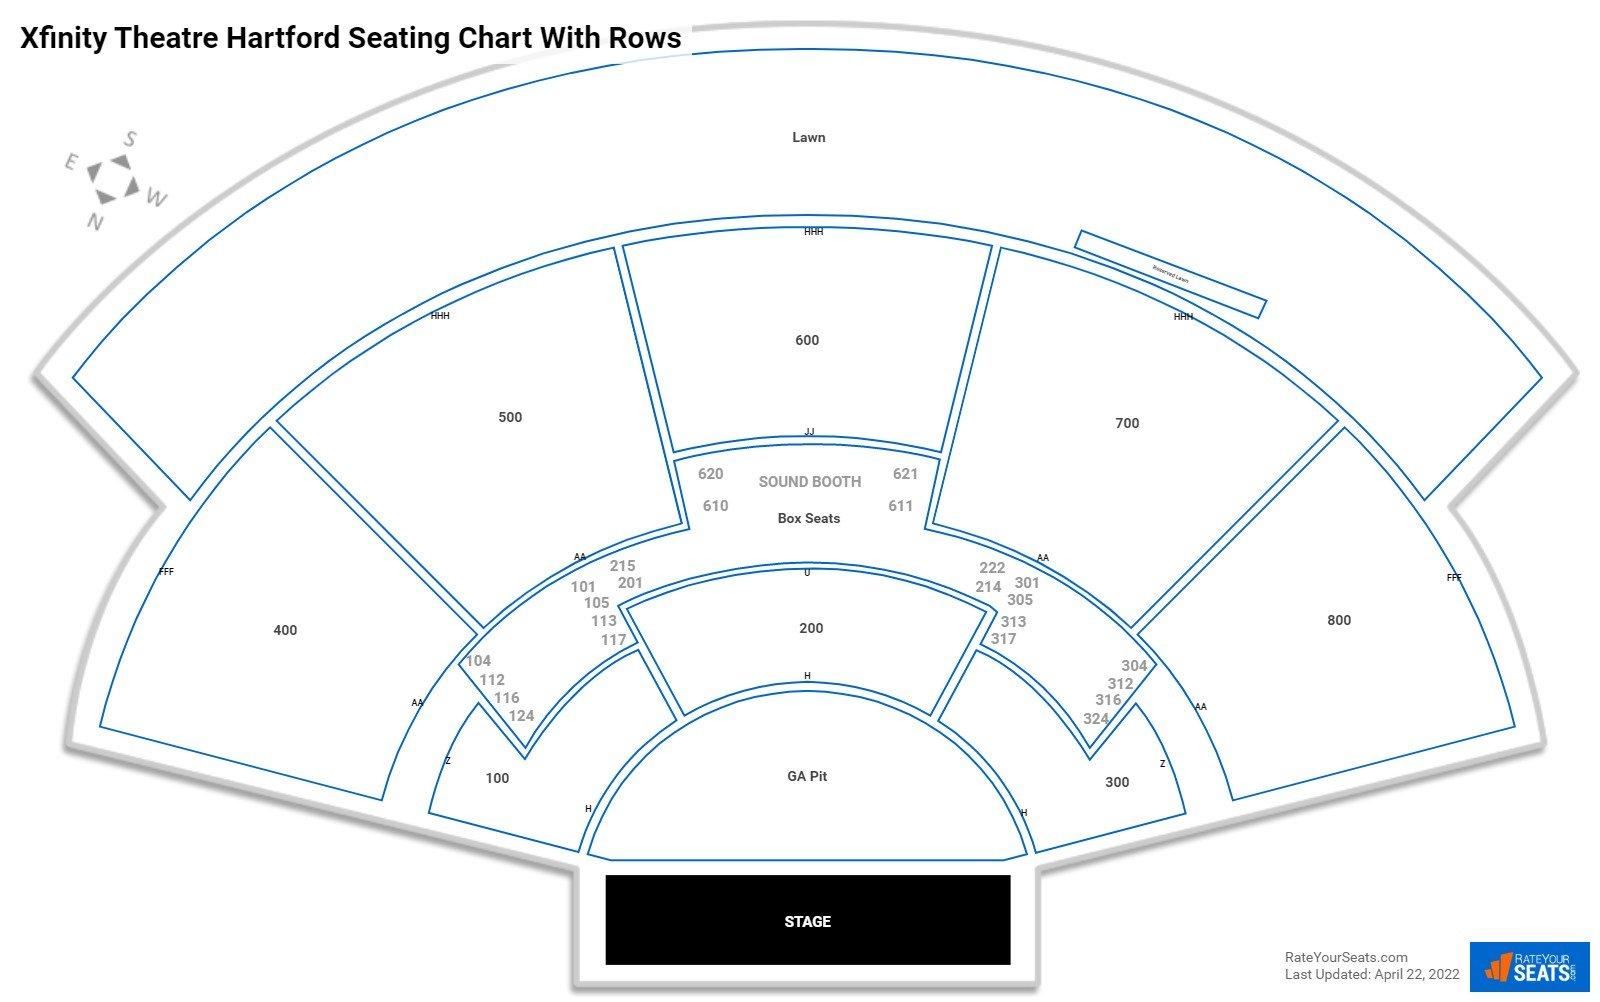 Xfinity Theatre Hartford Seating Chart Rateyourseats Com